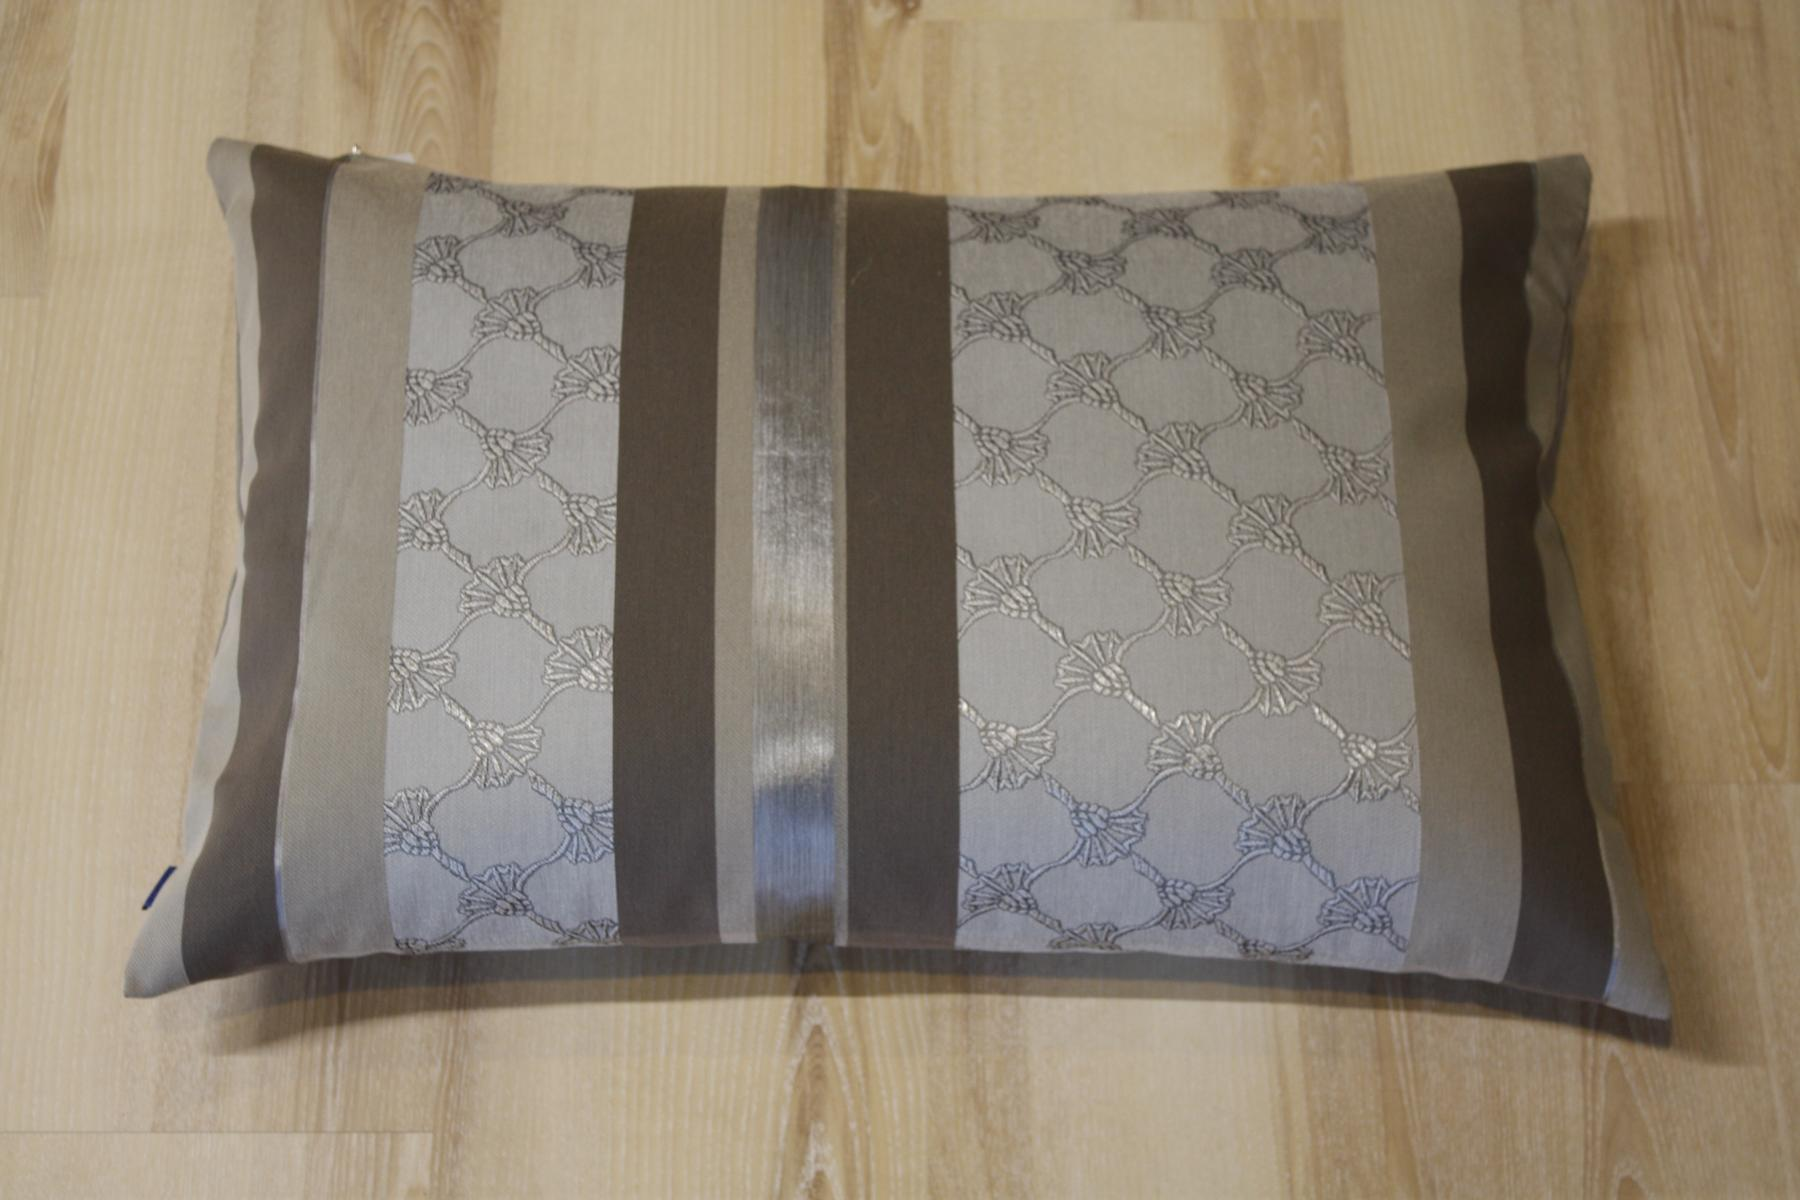 joop kissen lucent 010 kitt 40x60 cm inkl federf llung ebay. Black Bedroom Furniture Sets. Home Design Ideas